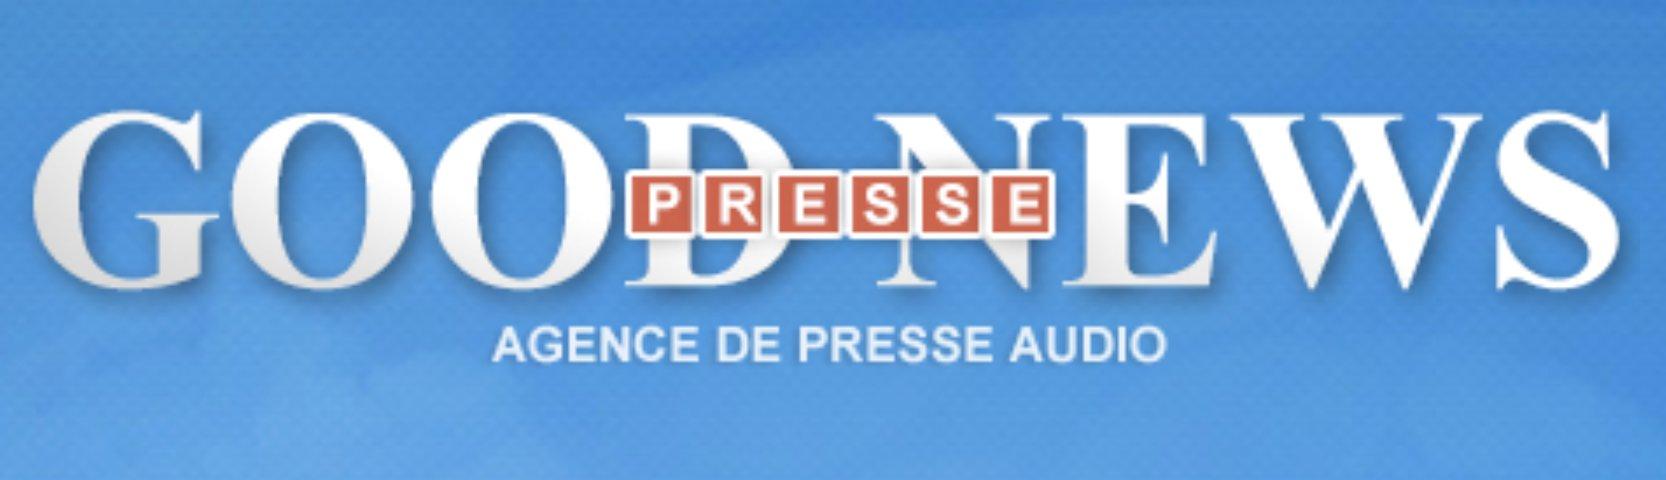 good news presse recherche une journaliste pr u00e9sentatrice